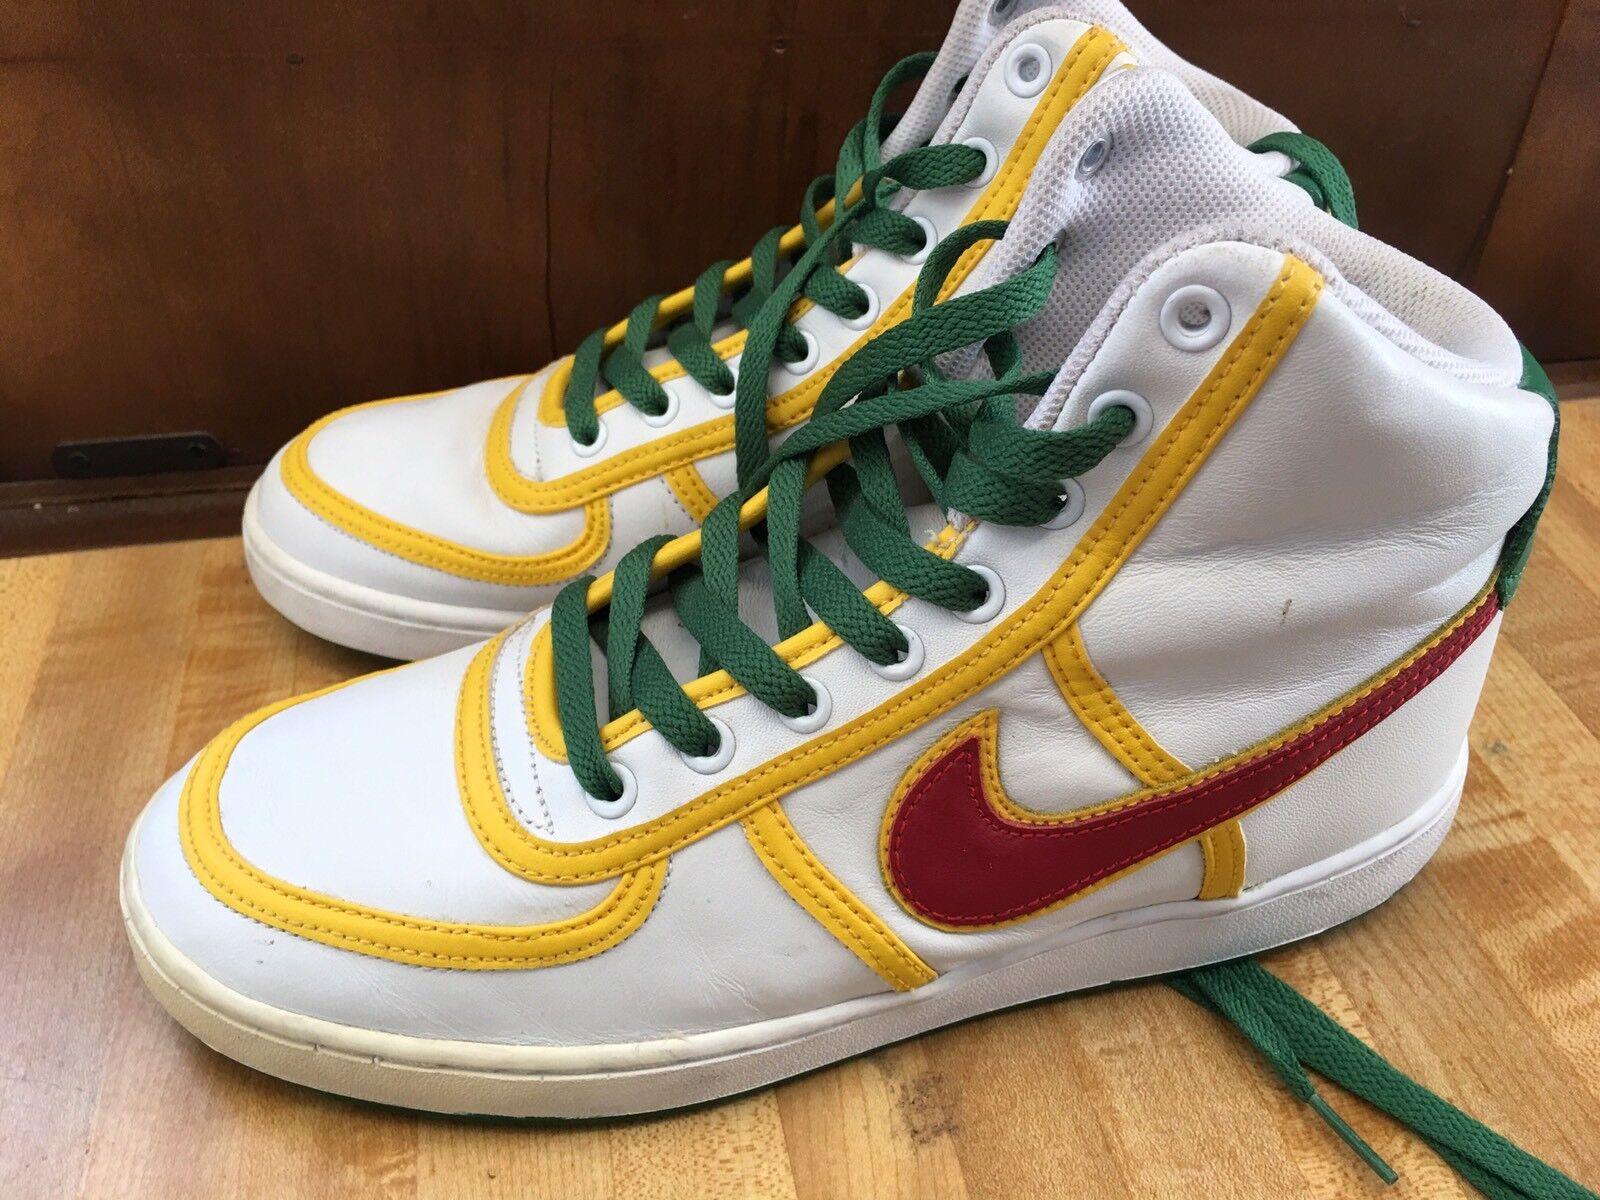 2018 Nike Vandal Hi Leather 309427-162 SZ SZ SZ 9 baratos zapatos de mujer zapatos de mujer 4f6b2f